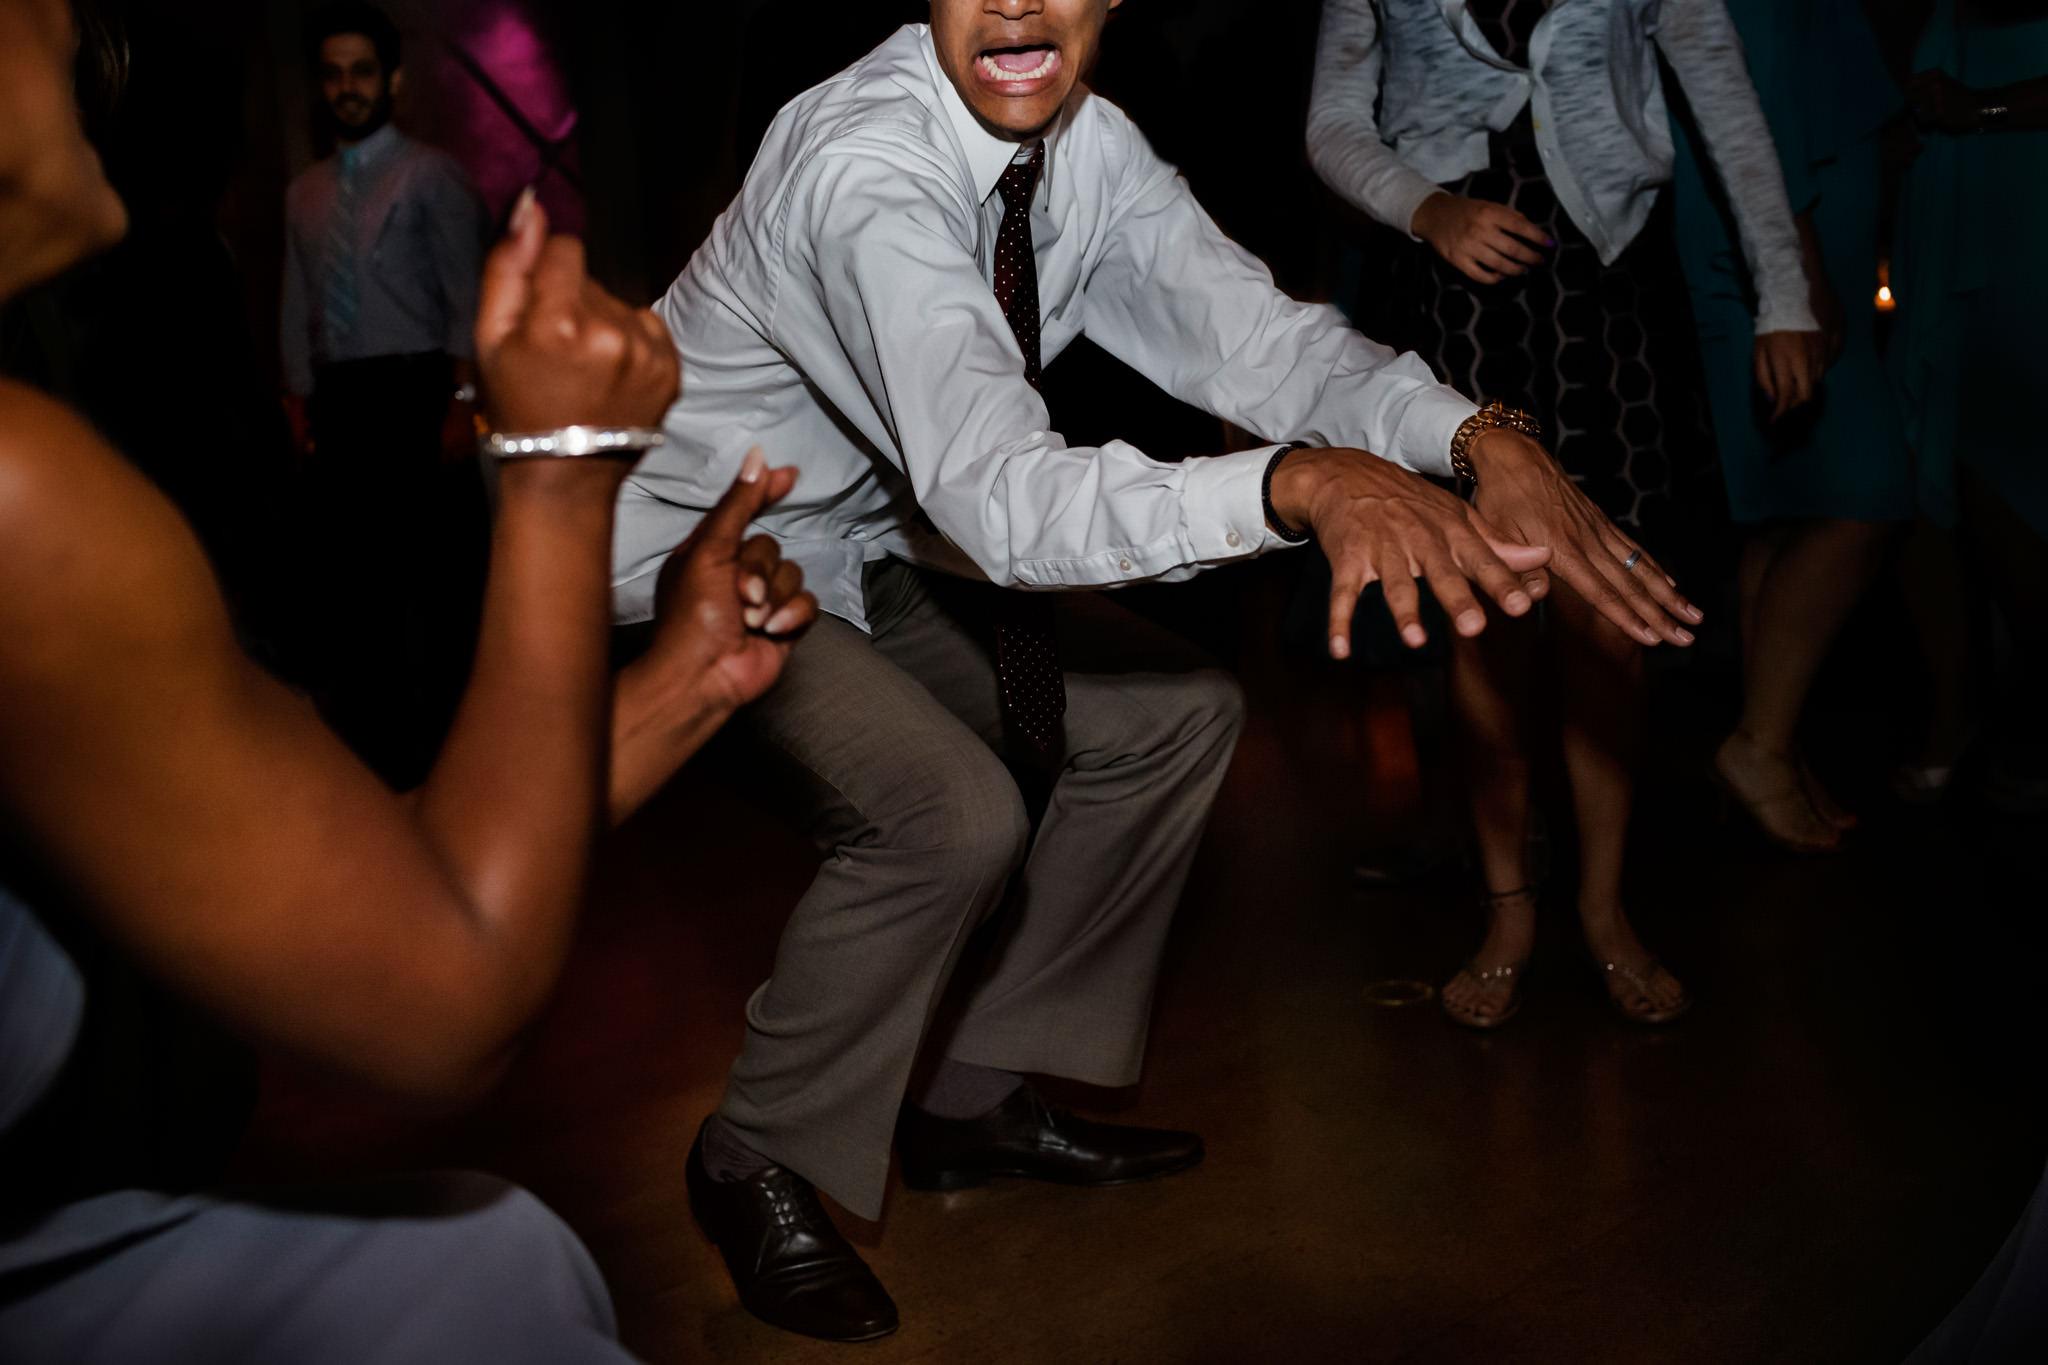 Wedding guests dance at wedding reception in San Francisco